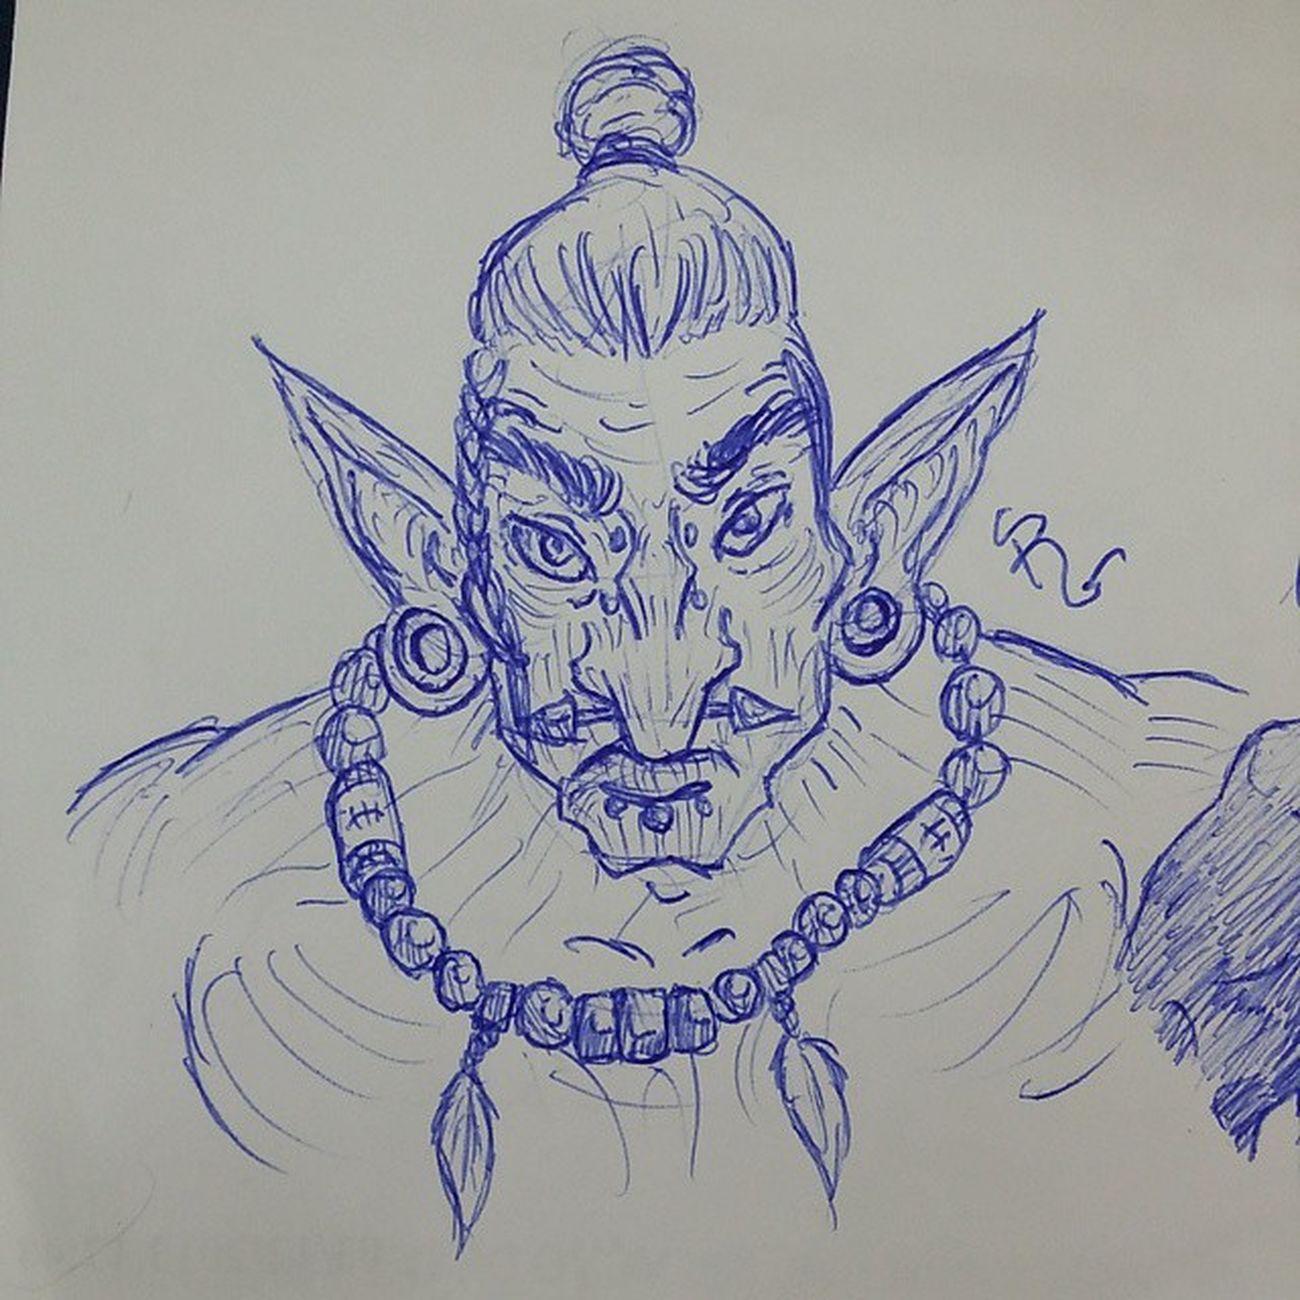 Troll WOW Worldofwarcraft Warcraft Warcraft3